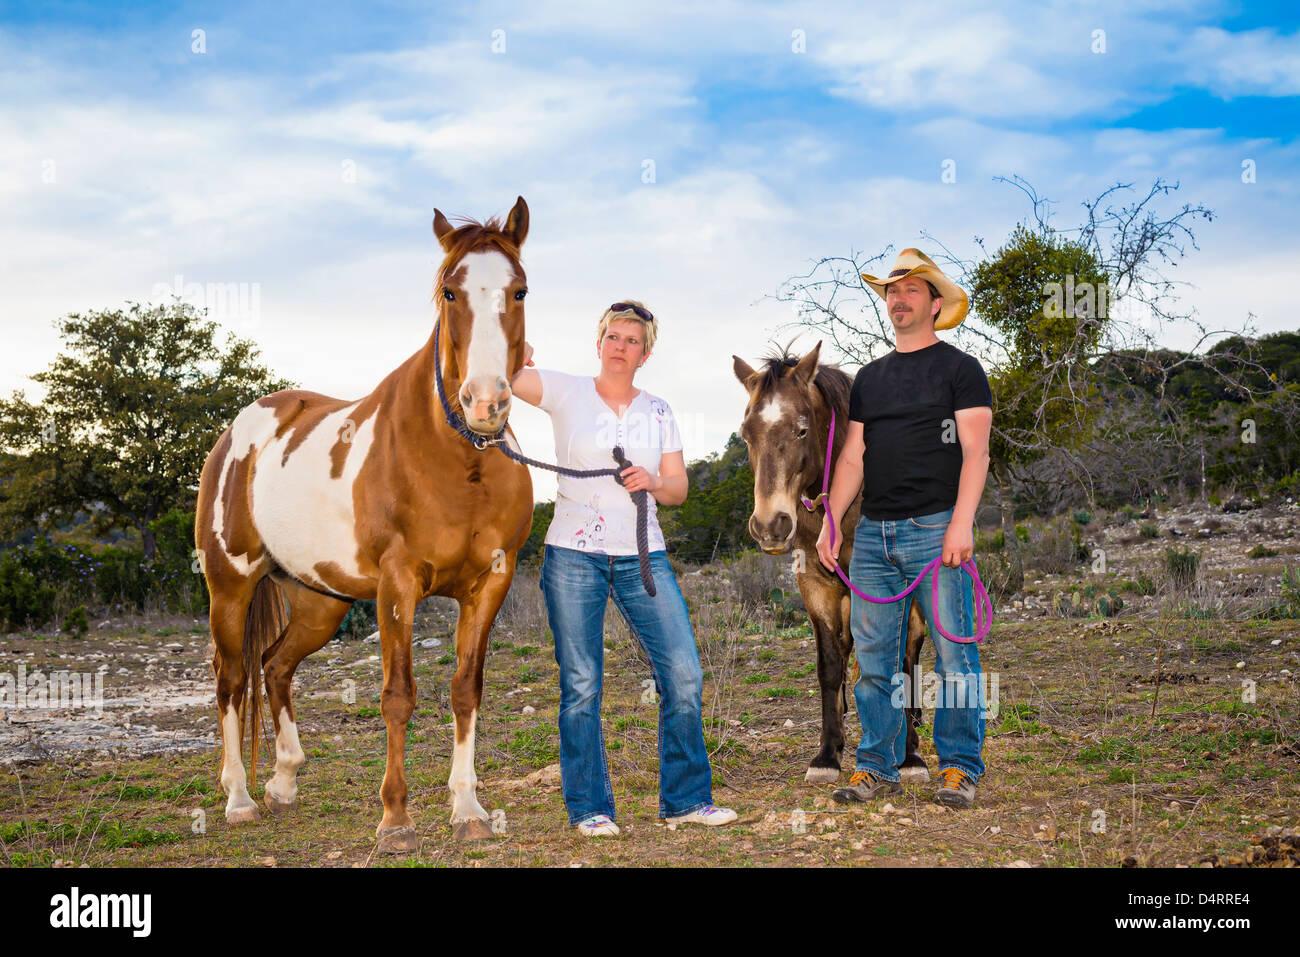 Mature couple with horses, Male 50 Caucasian, Female 45 Caucasian, Texas, USA - Stock Image